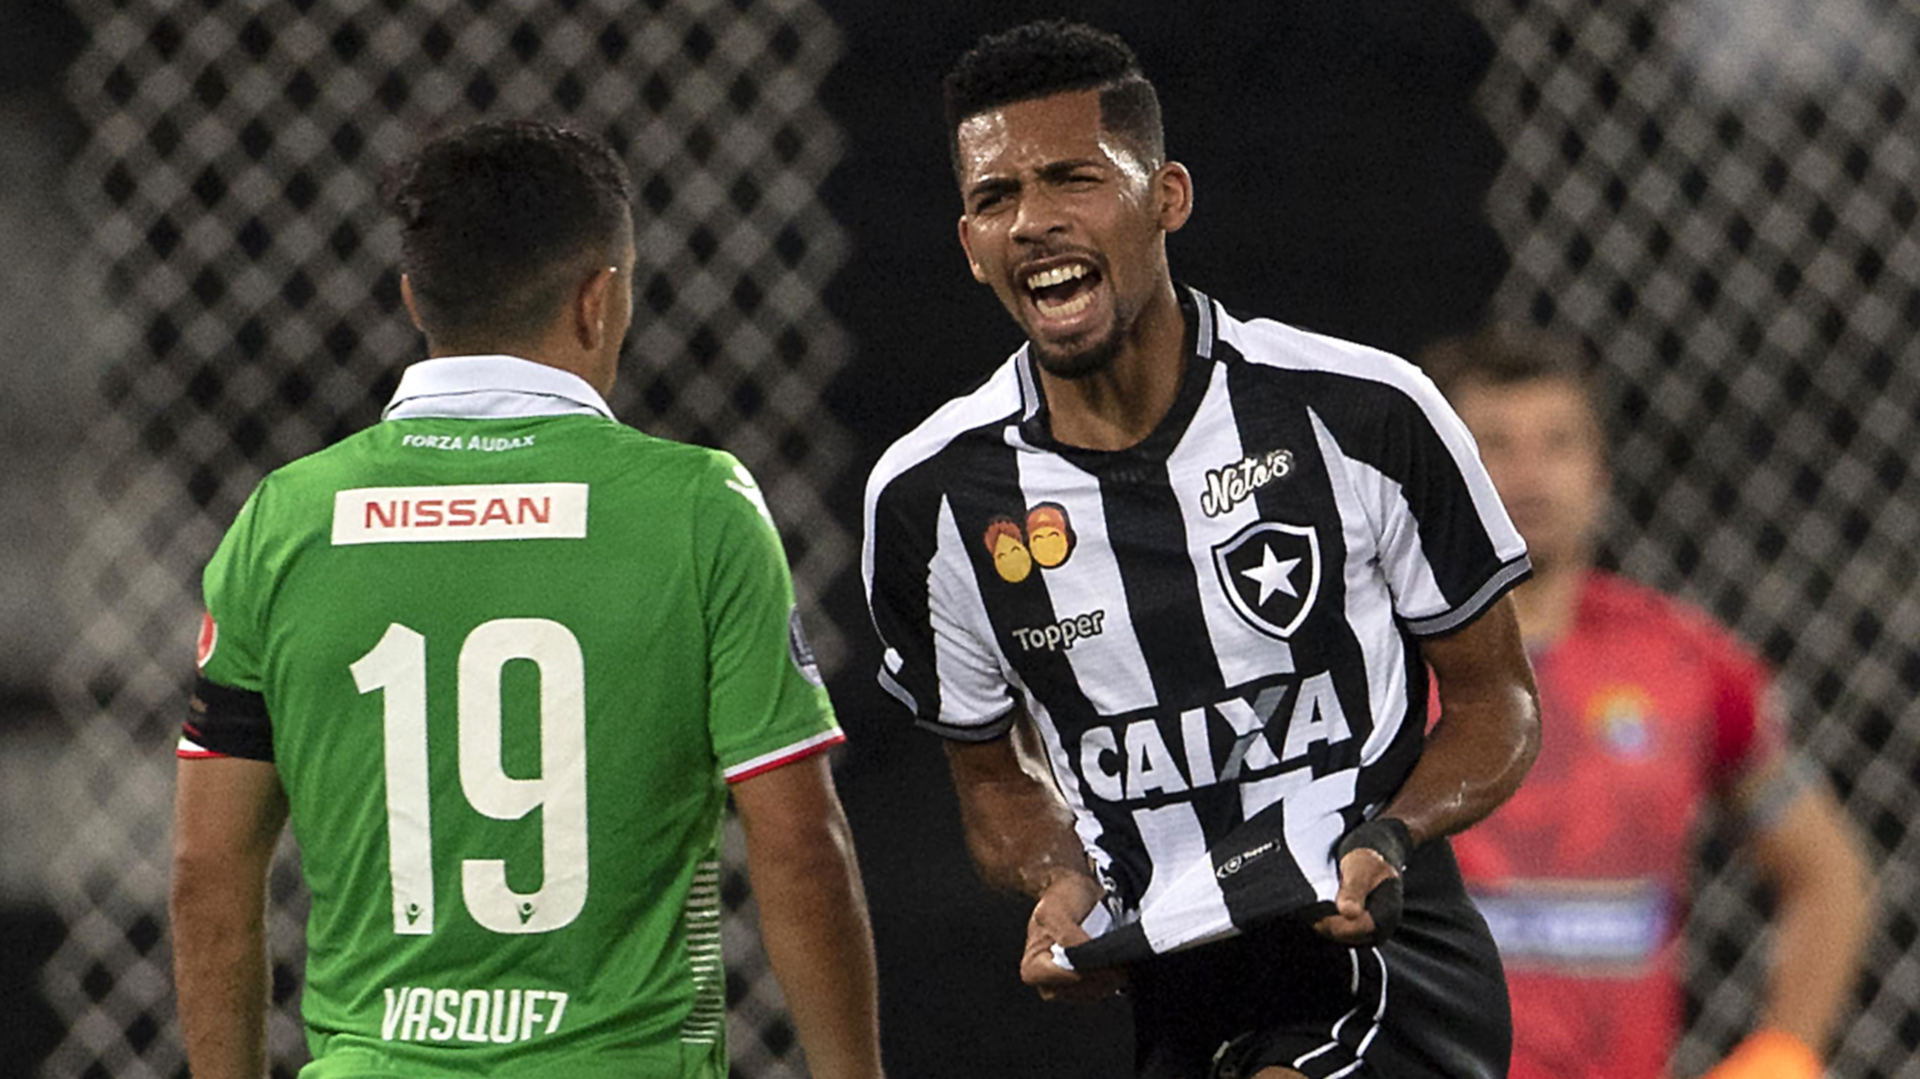 Matheus Fernandes Botafogo Audax Italiano Copa Sudamericana 09052018